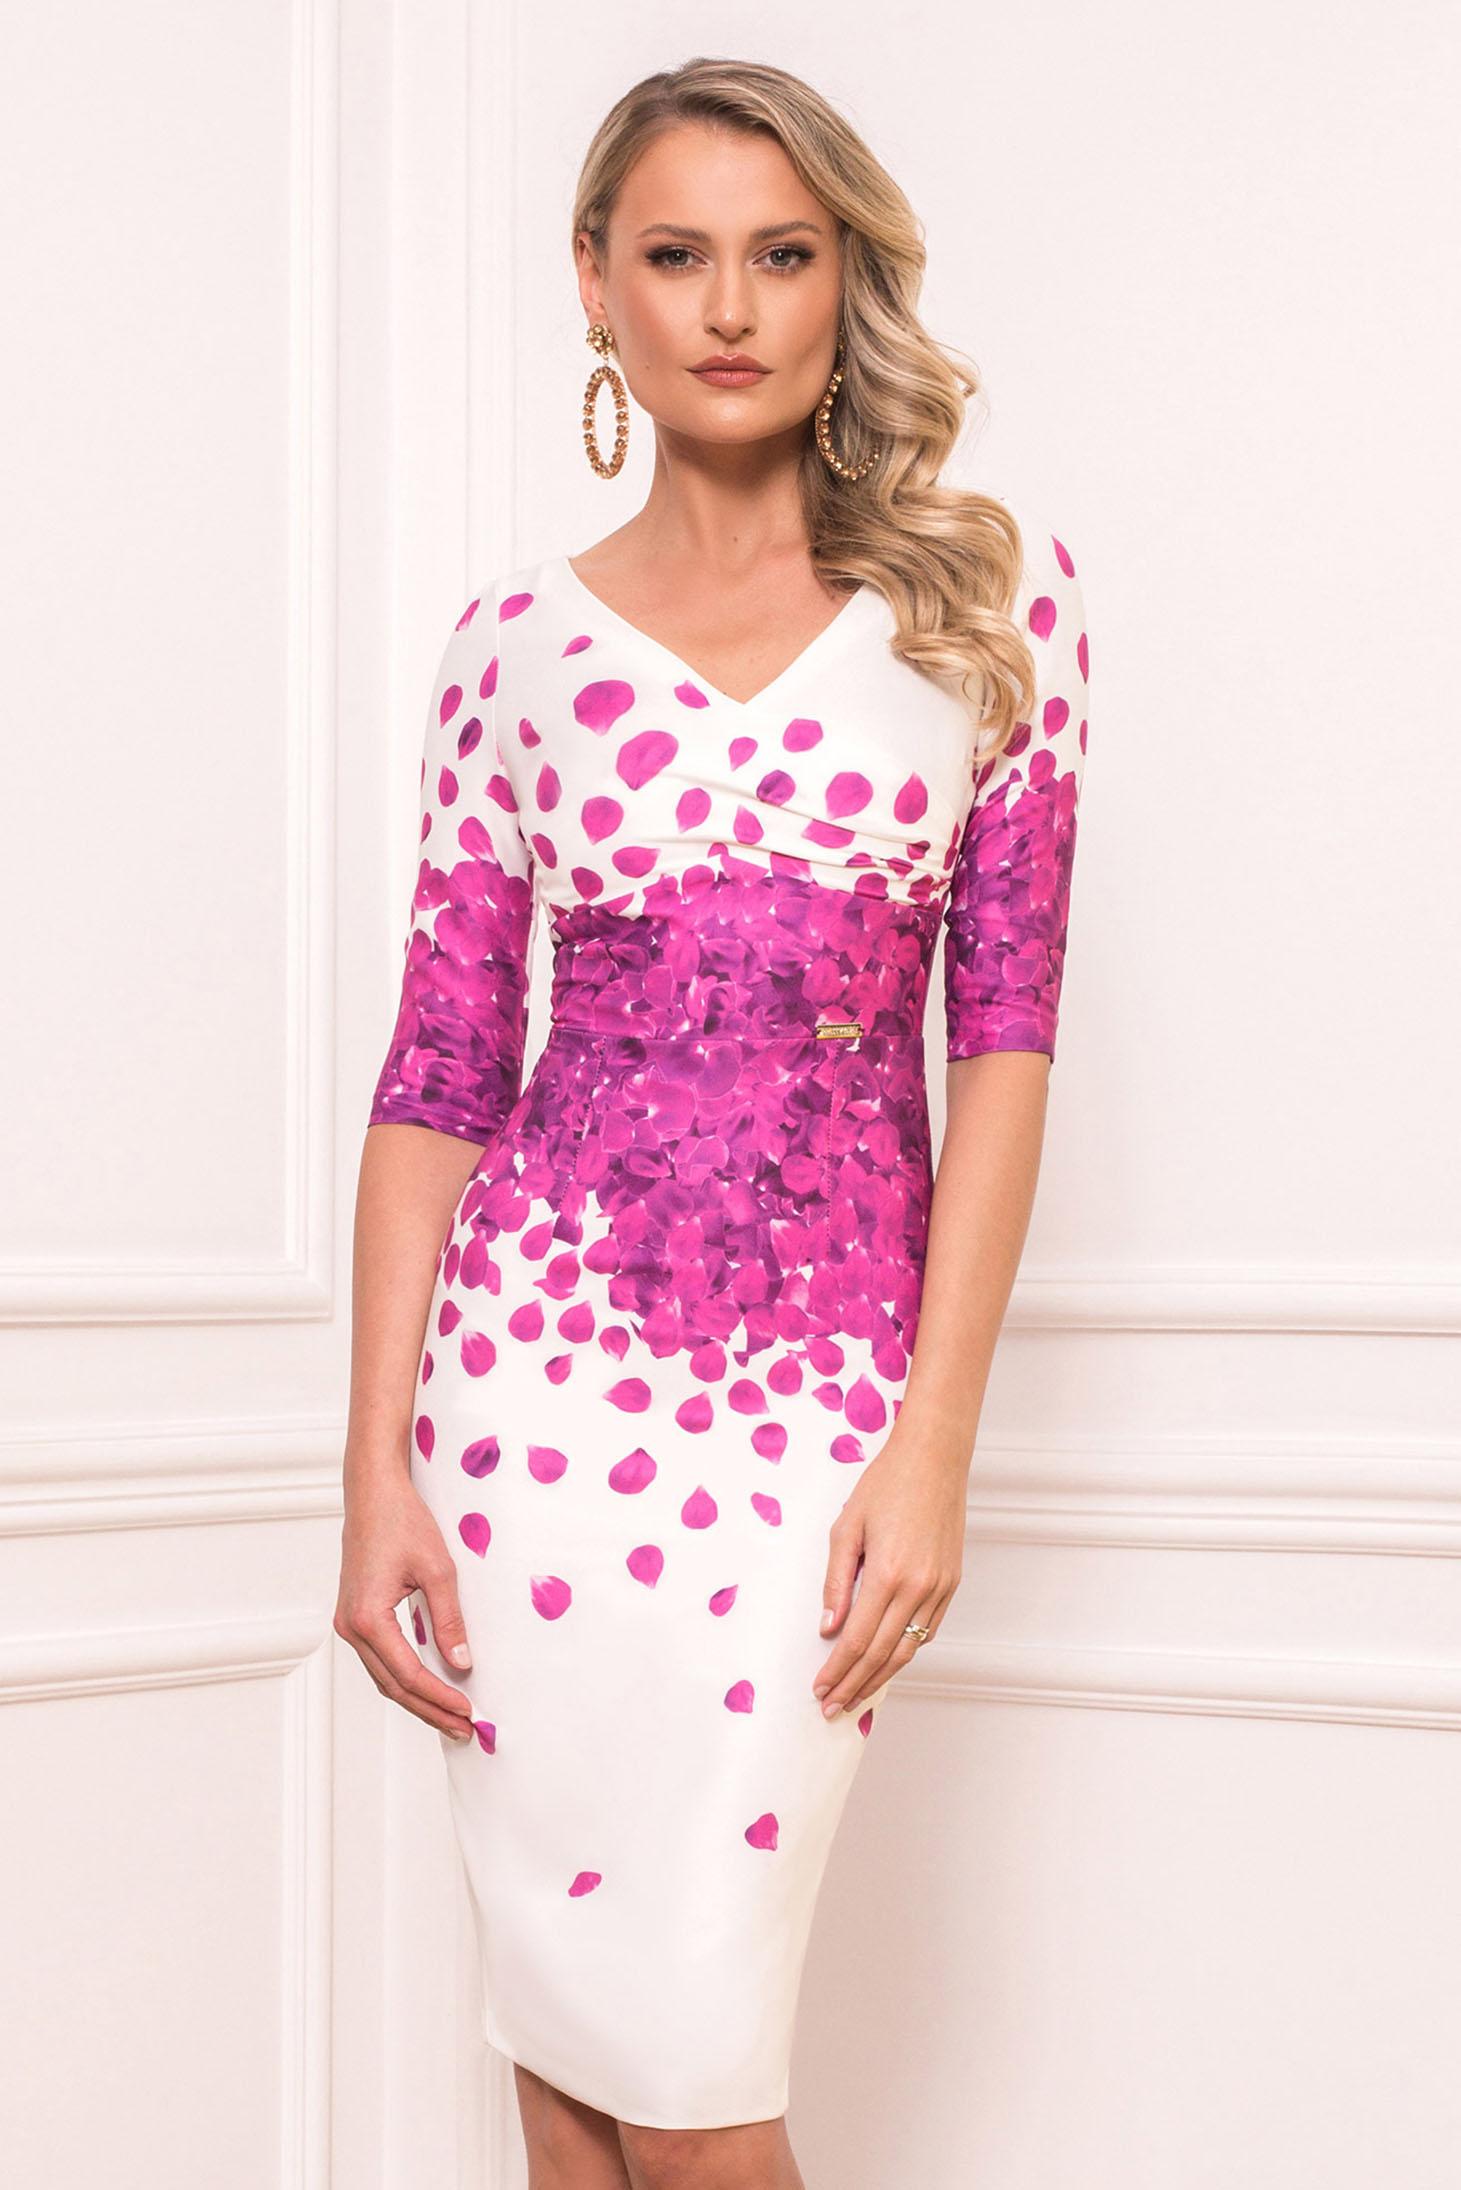 Fuchsia elegant midi cloth dress slightly elastic fabric short sleeves with v-neckline